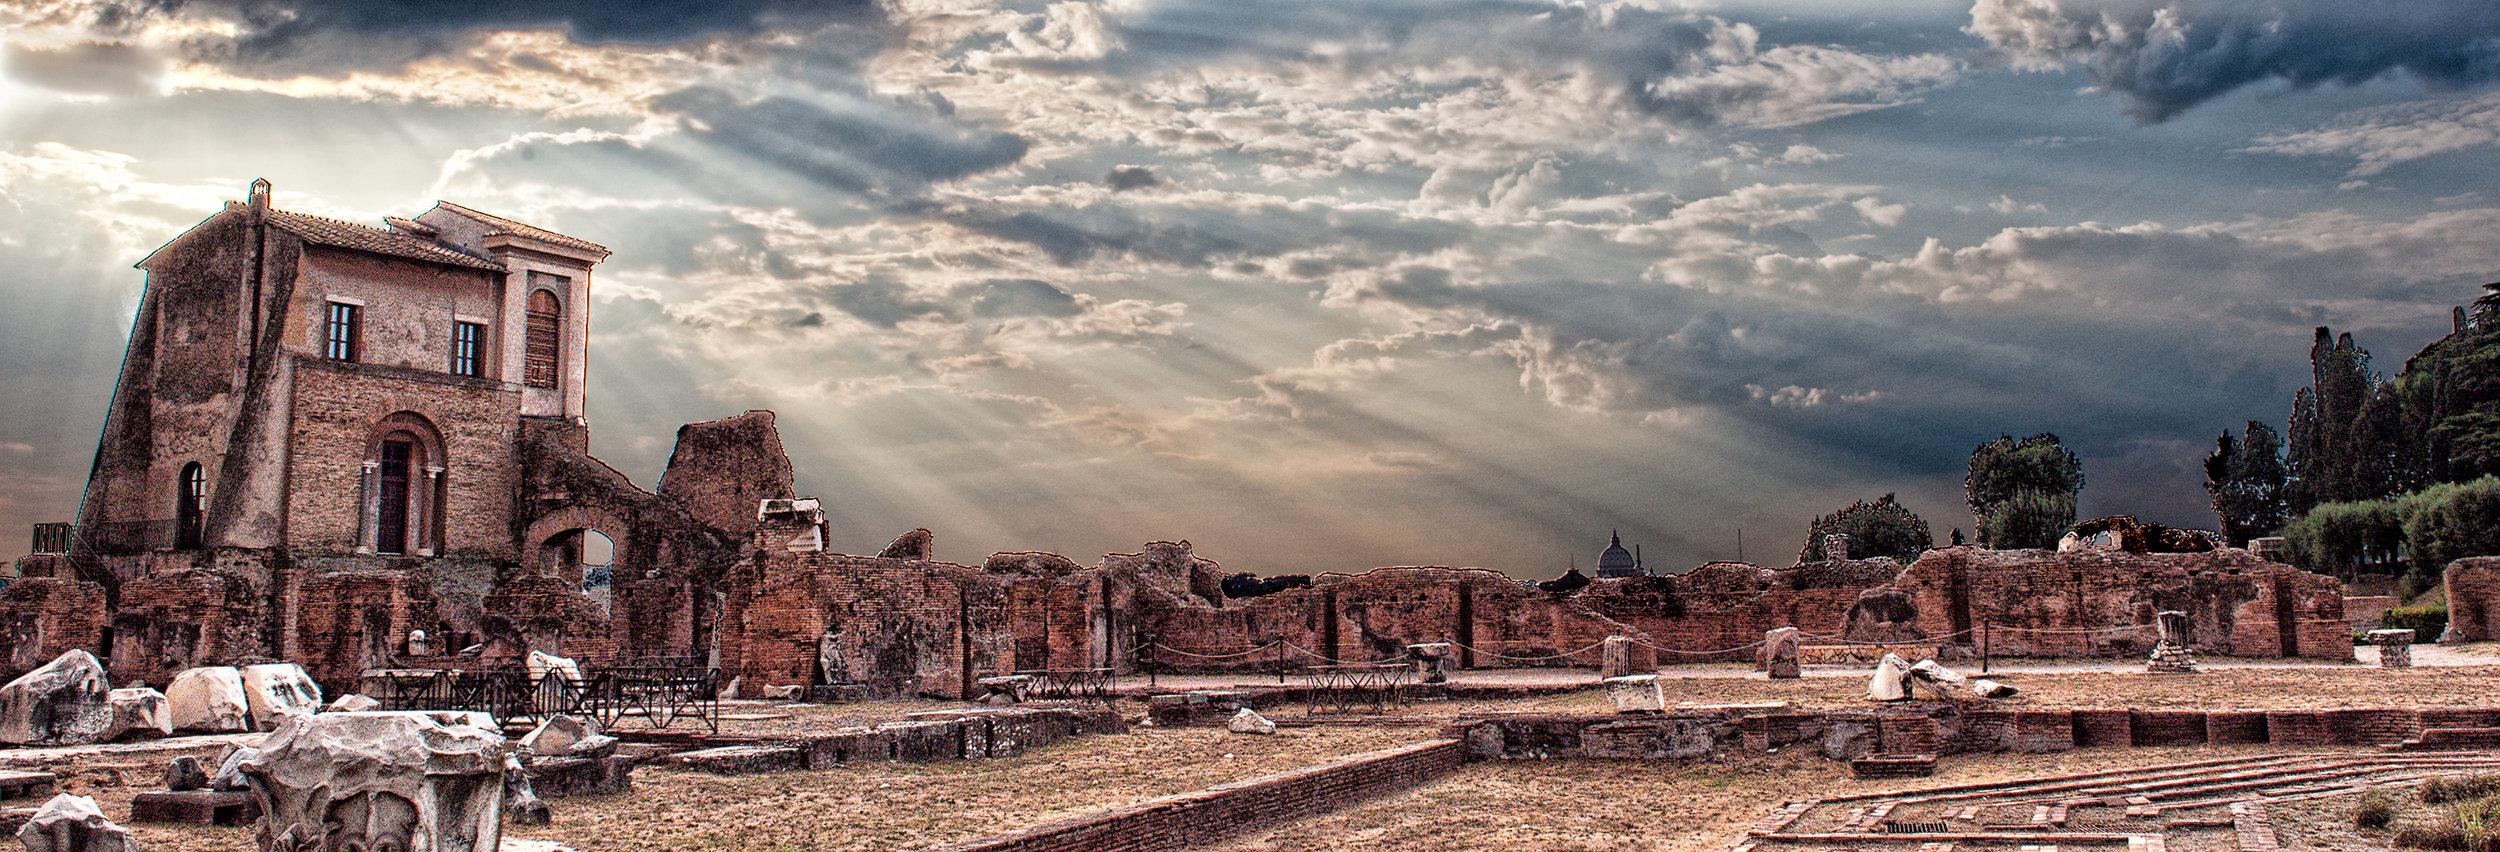 Italy-John Bardell-0612a.jpg